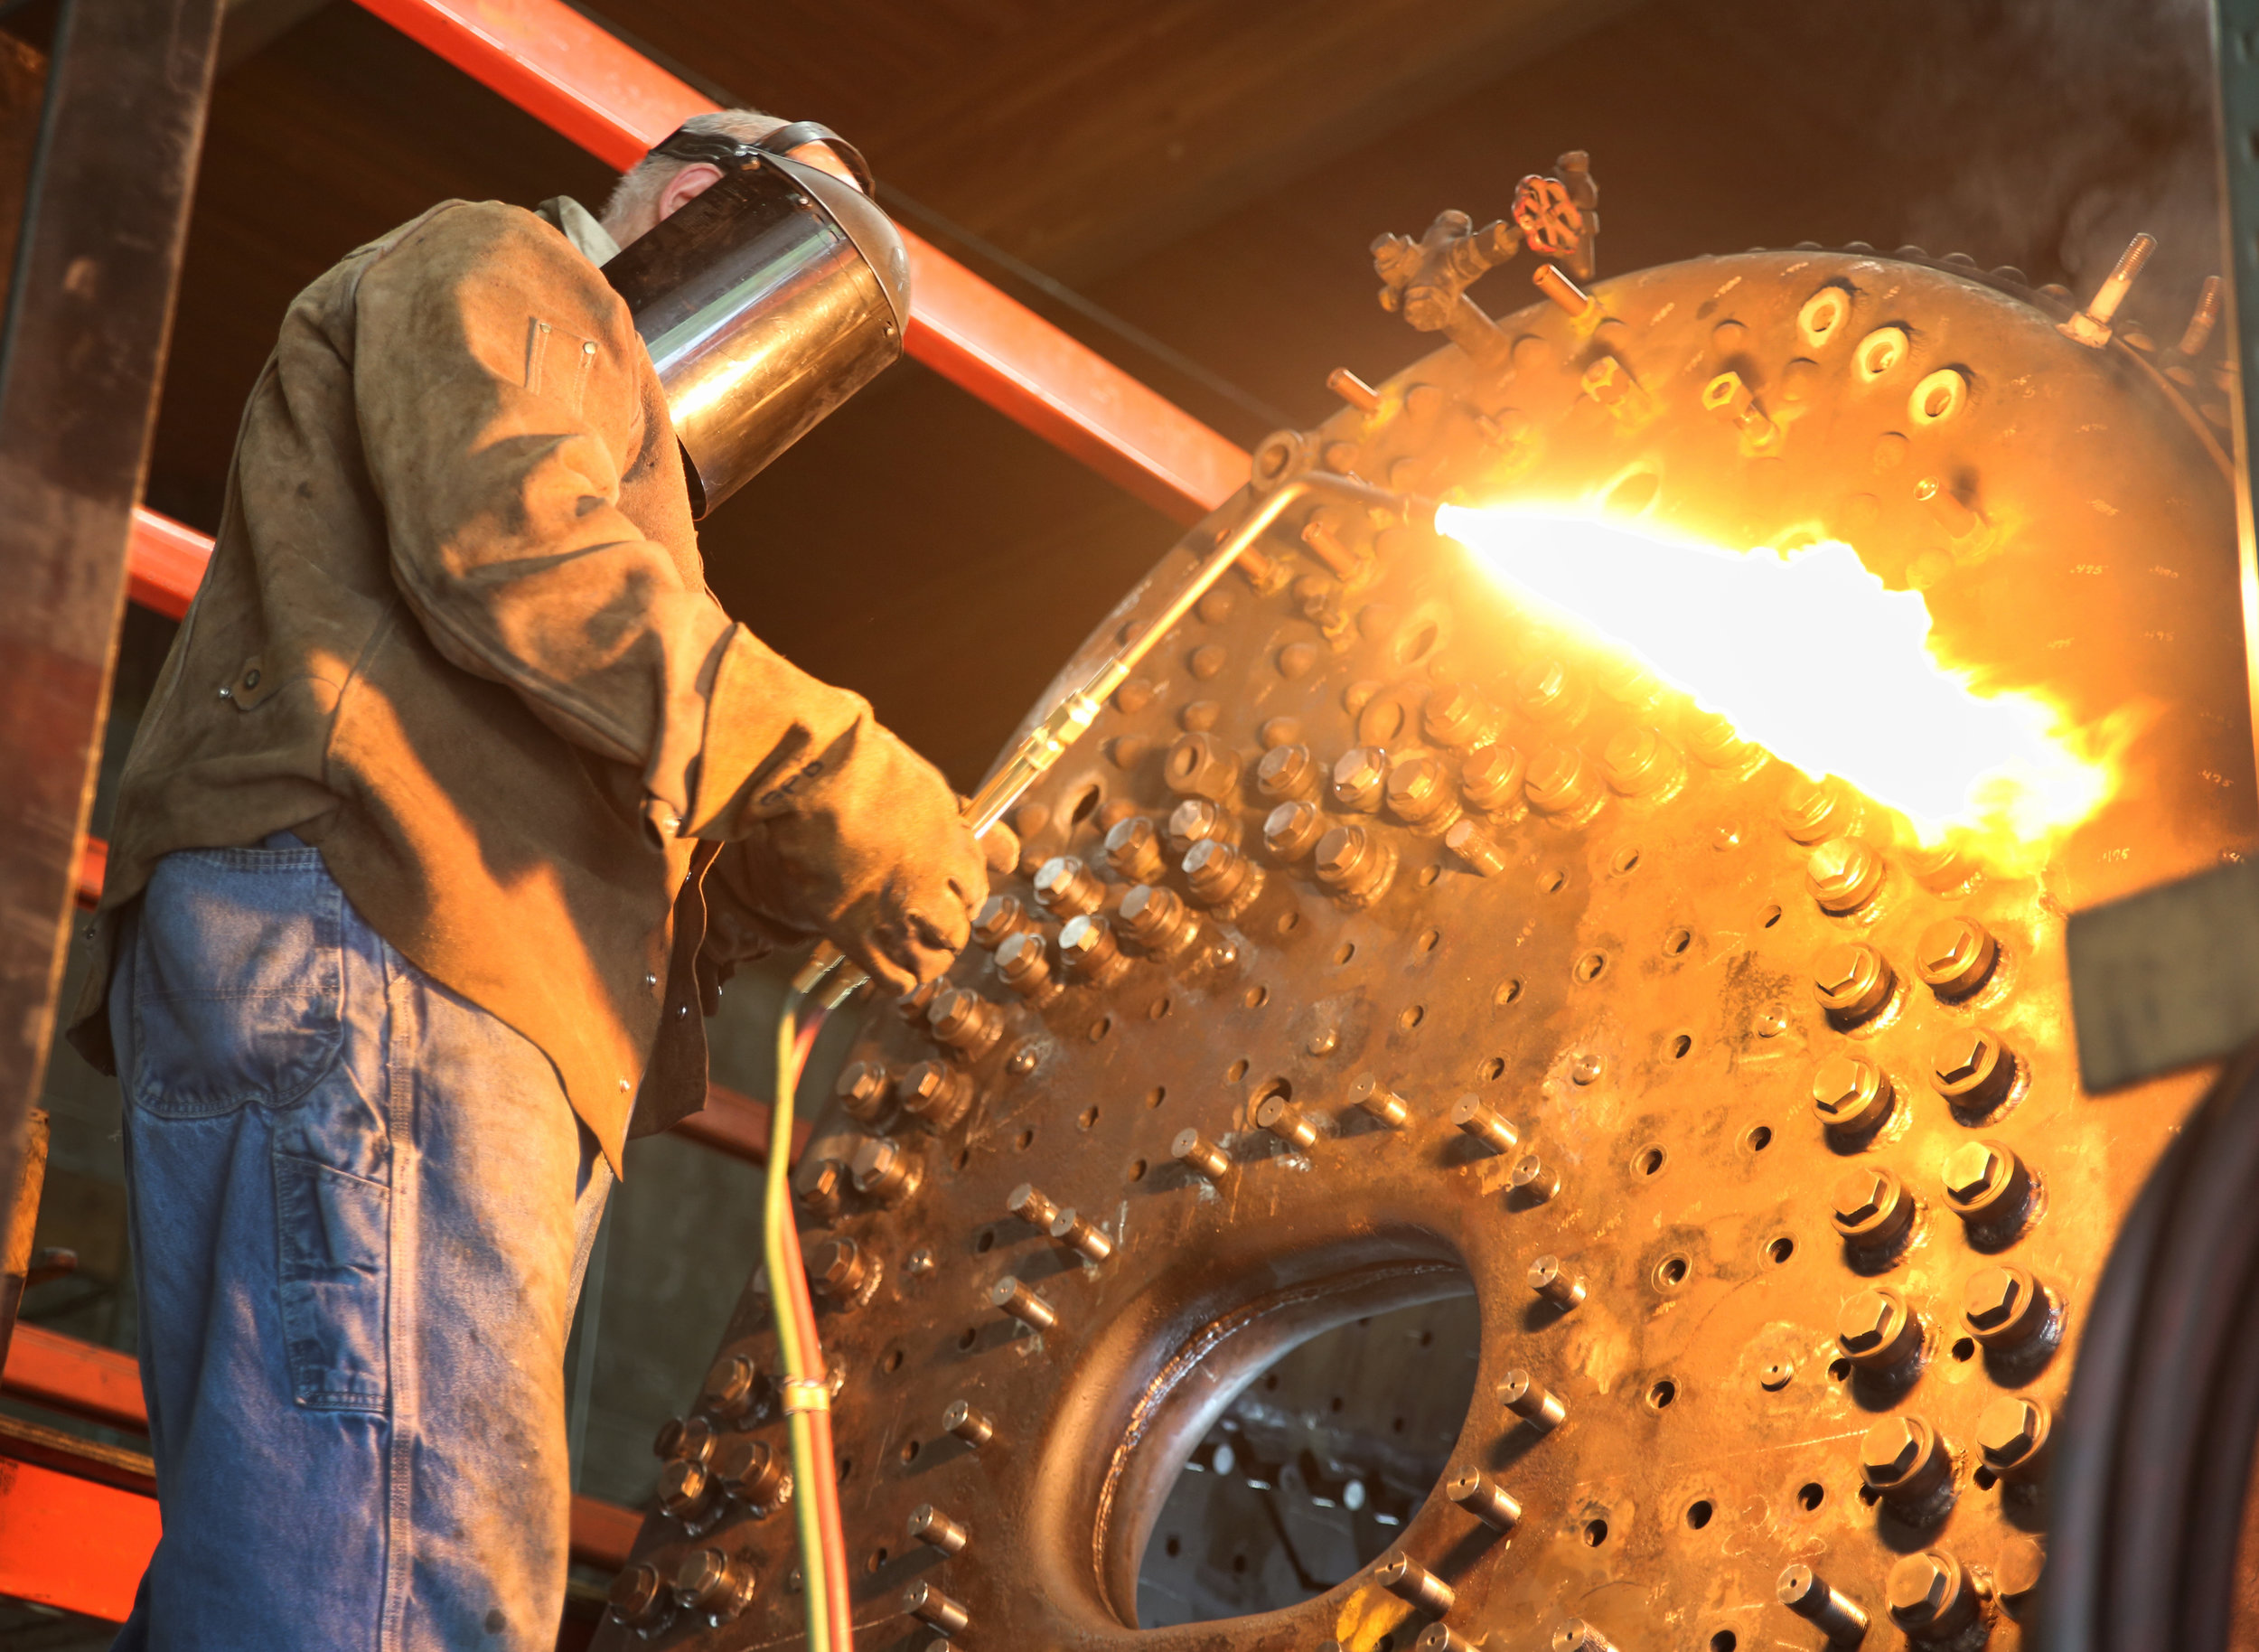 cutting torch on engine 557.jpg